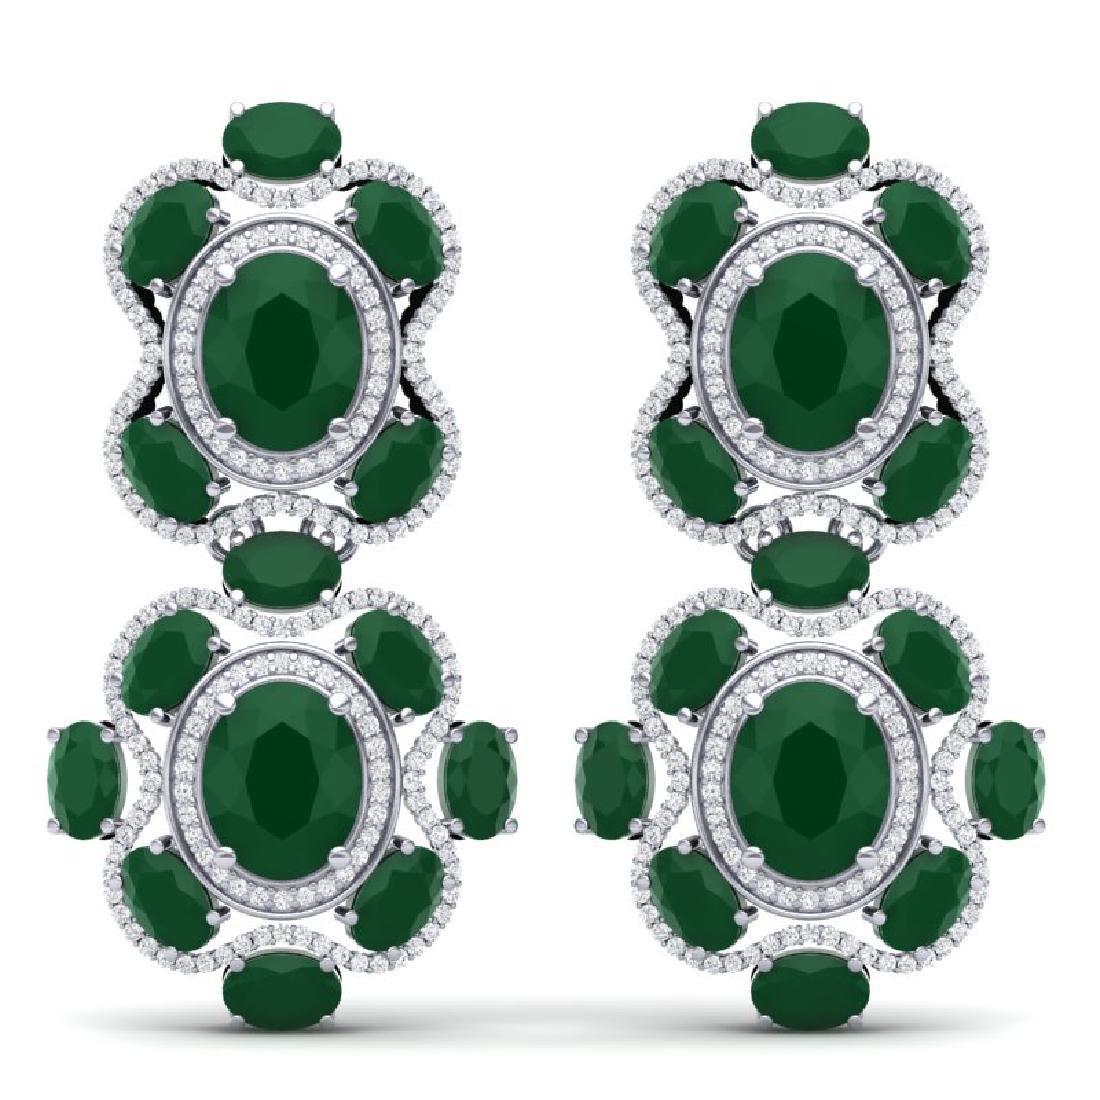 33.5 CTW Royalty Emerald & VS Diamond Earrings 18K